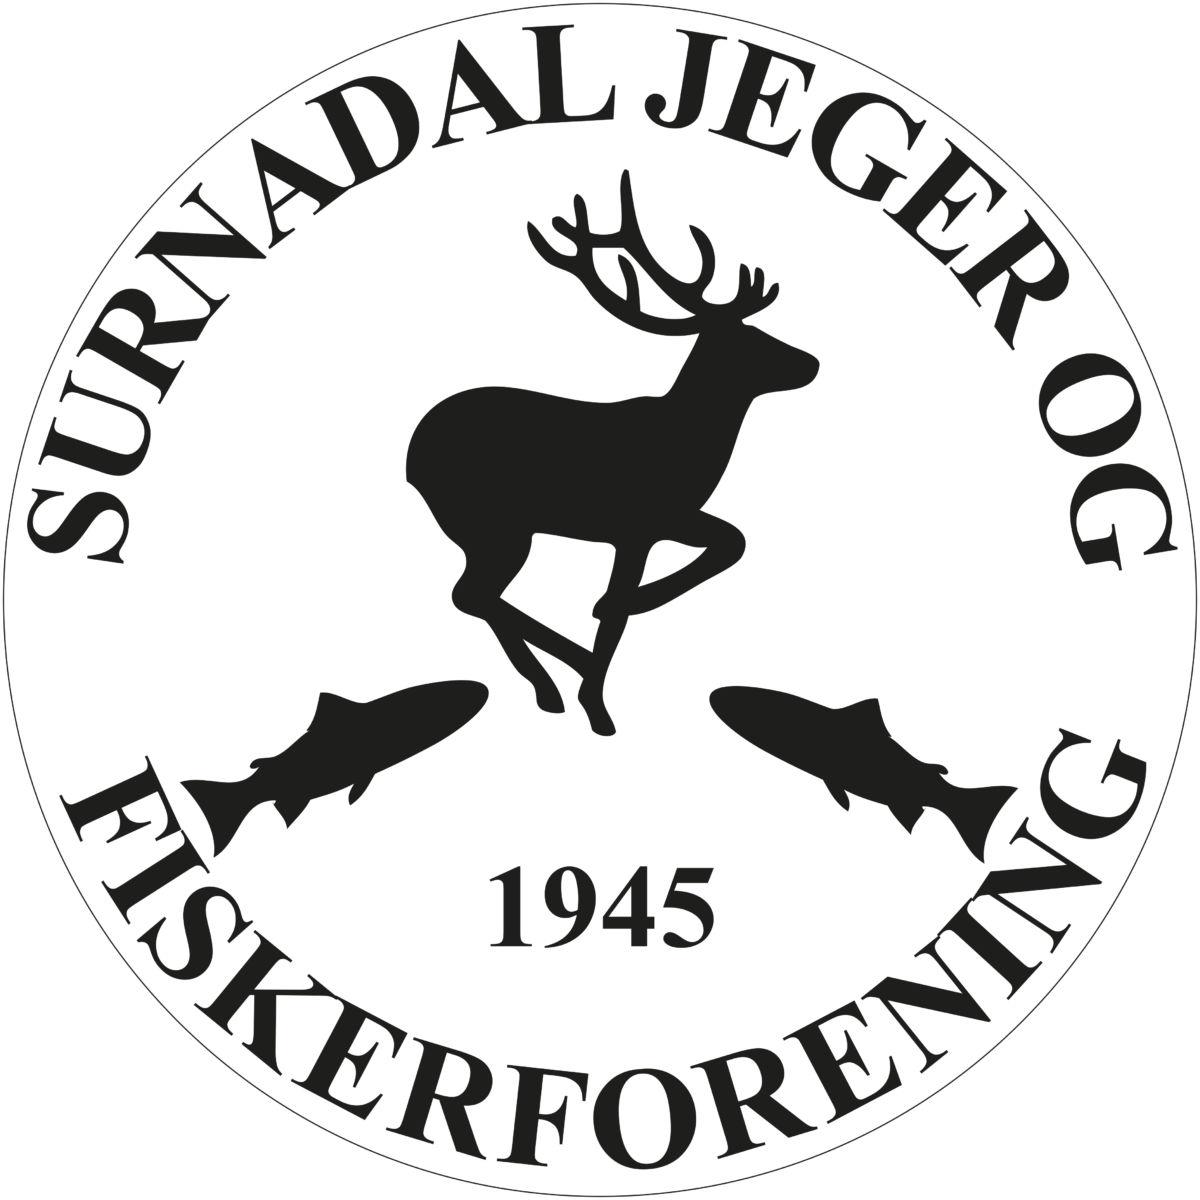 SJFF med årsmøte den 28. februar 2019.